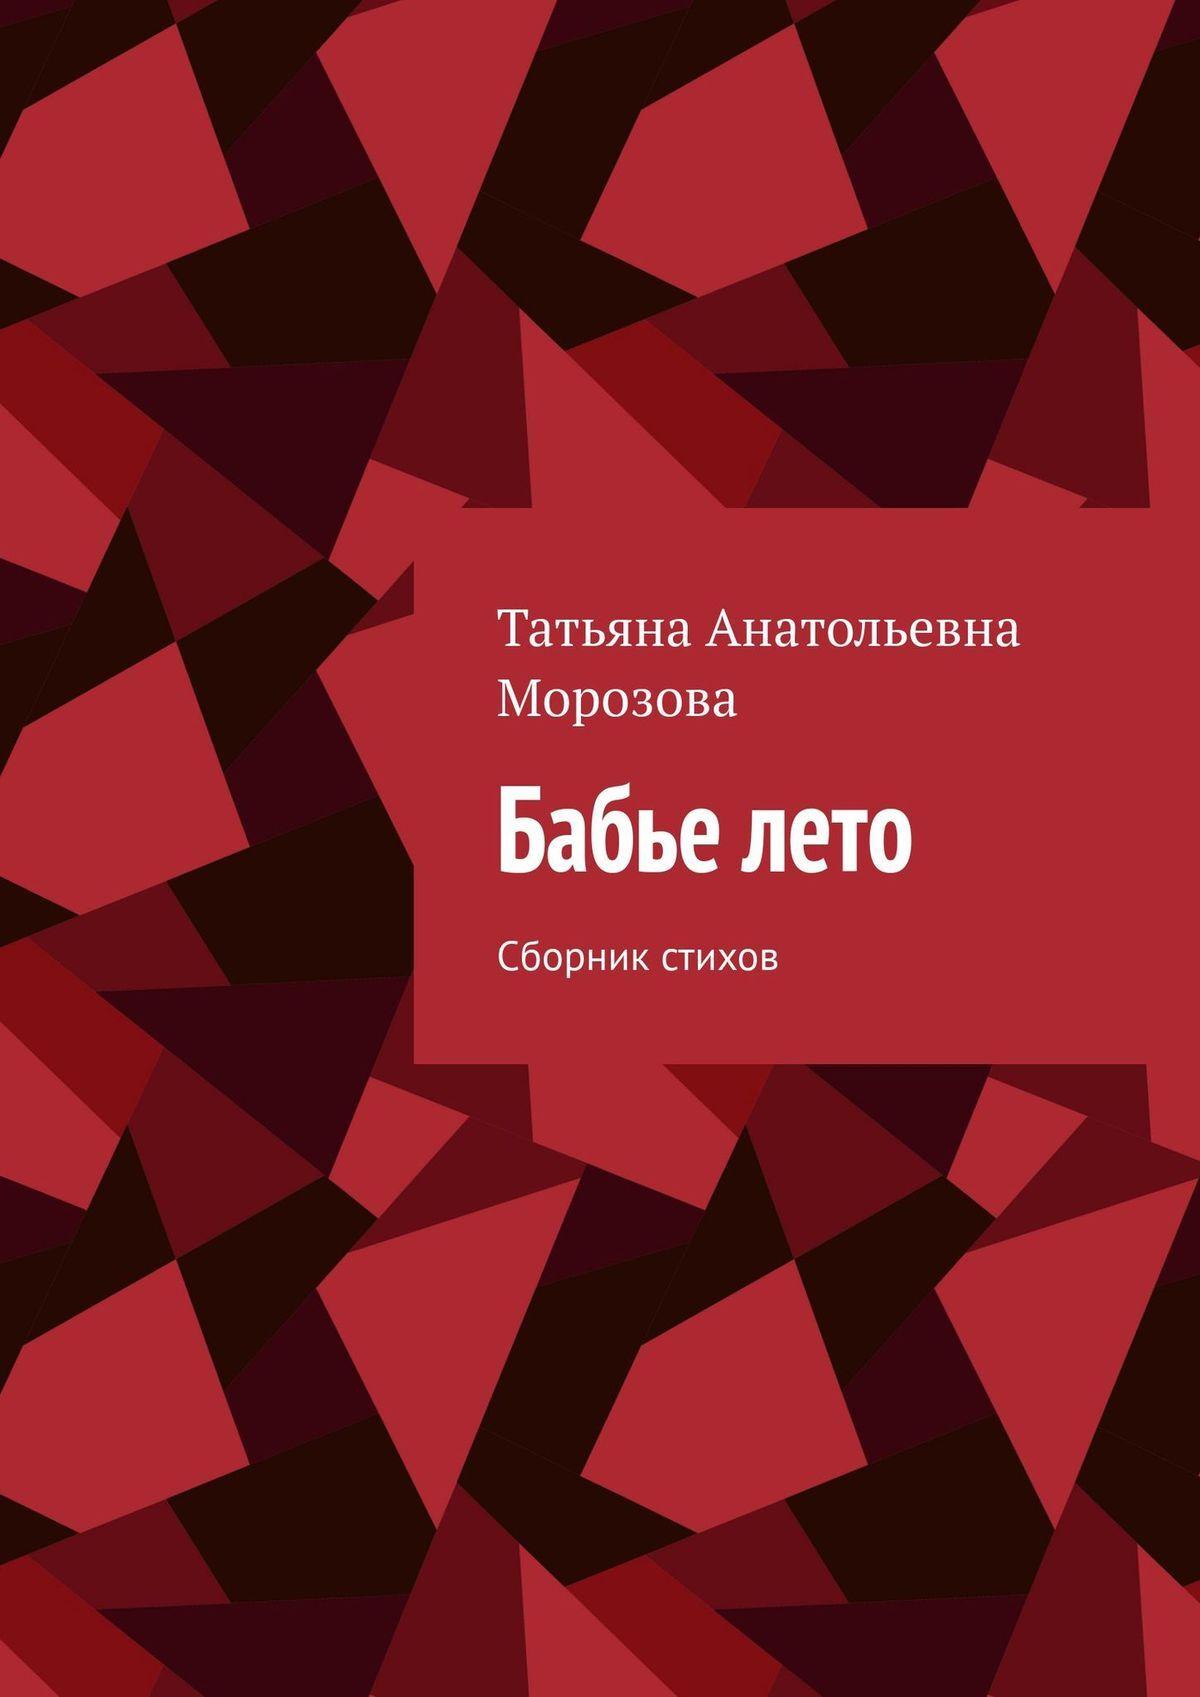 Татьяна Анатольевна Морозова Бабье лето. Сборник стихов